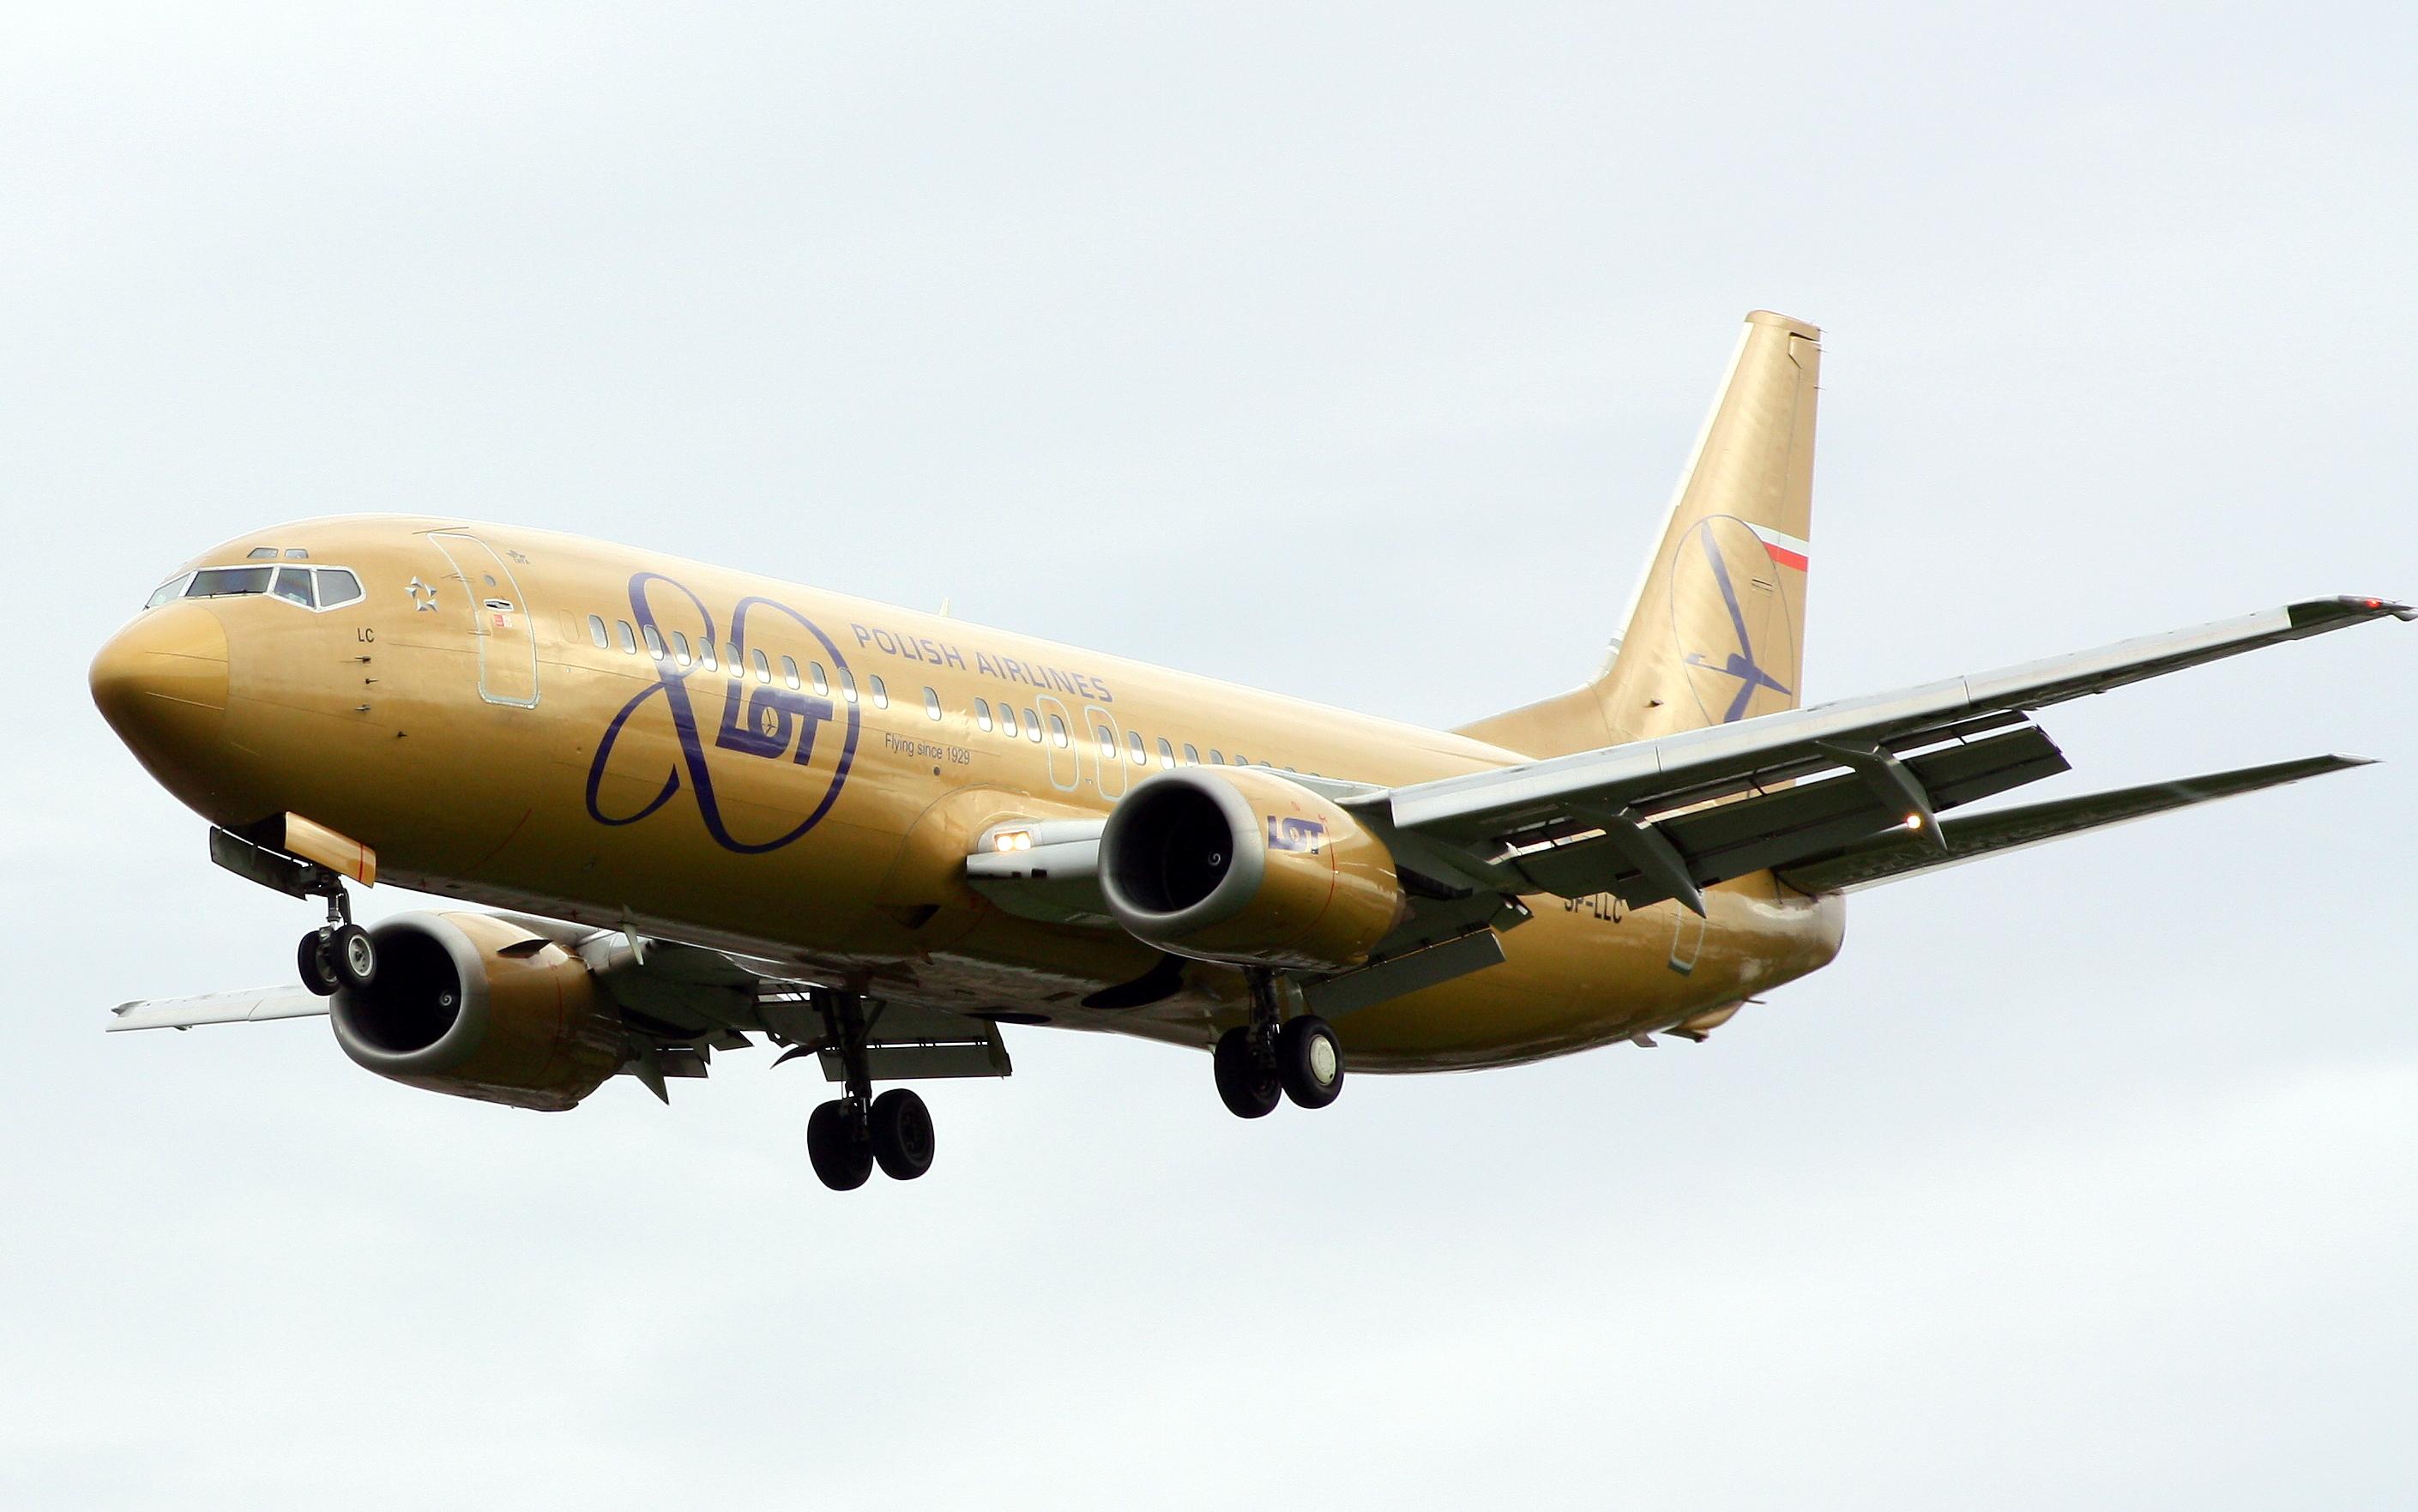 file lot polish airlines boeing 737 400 sp llc golden livery jpg